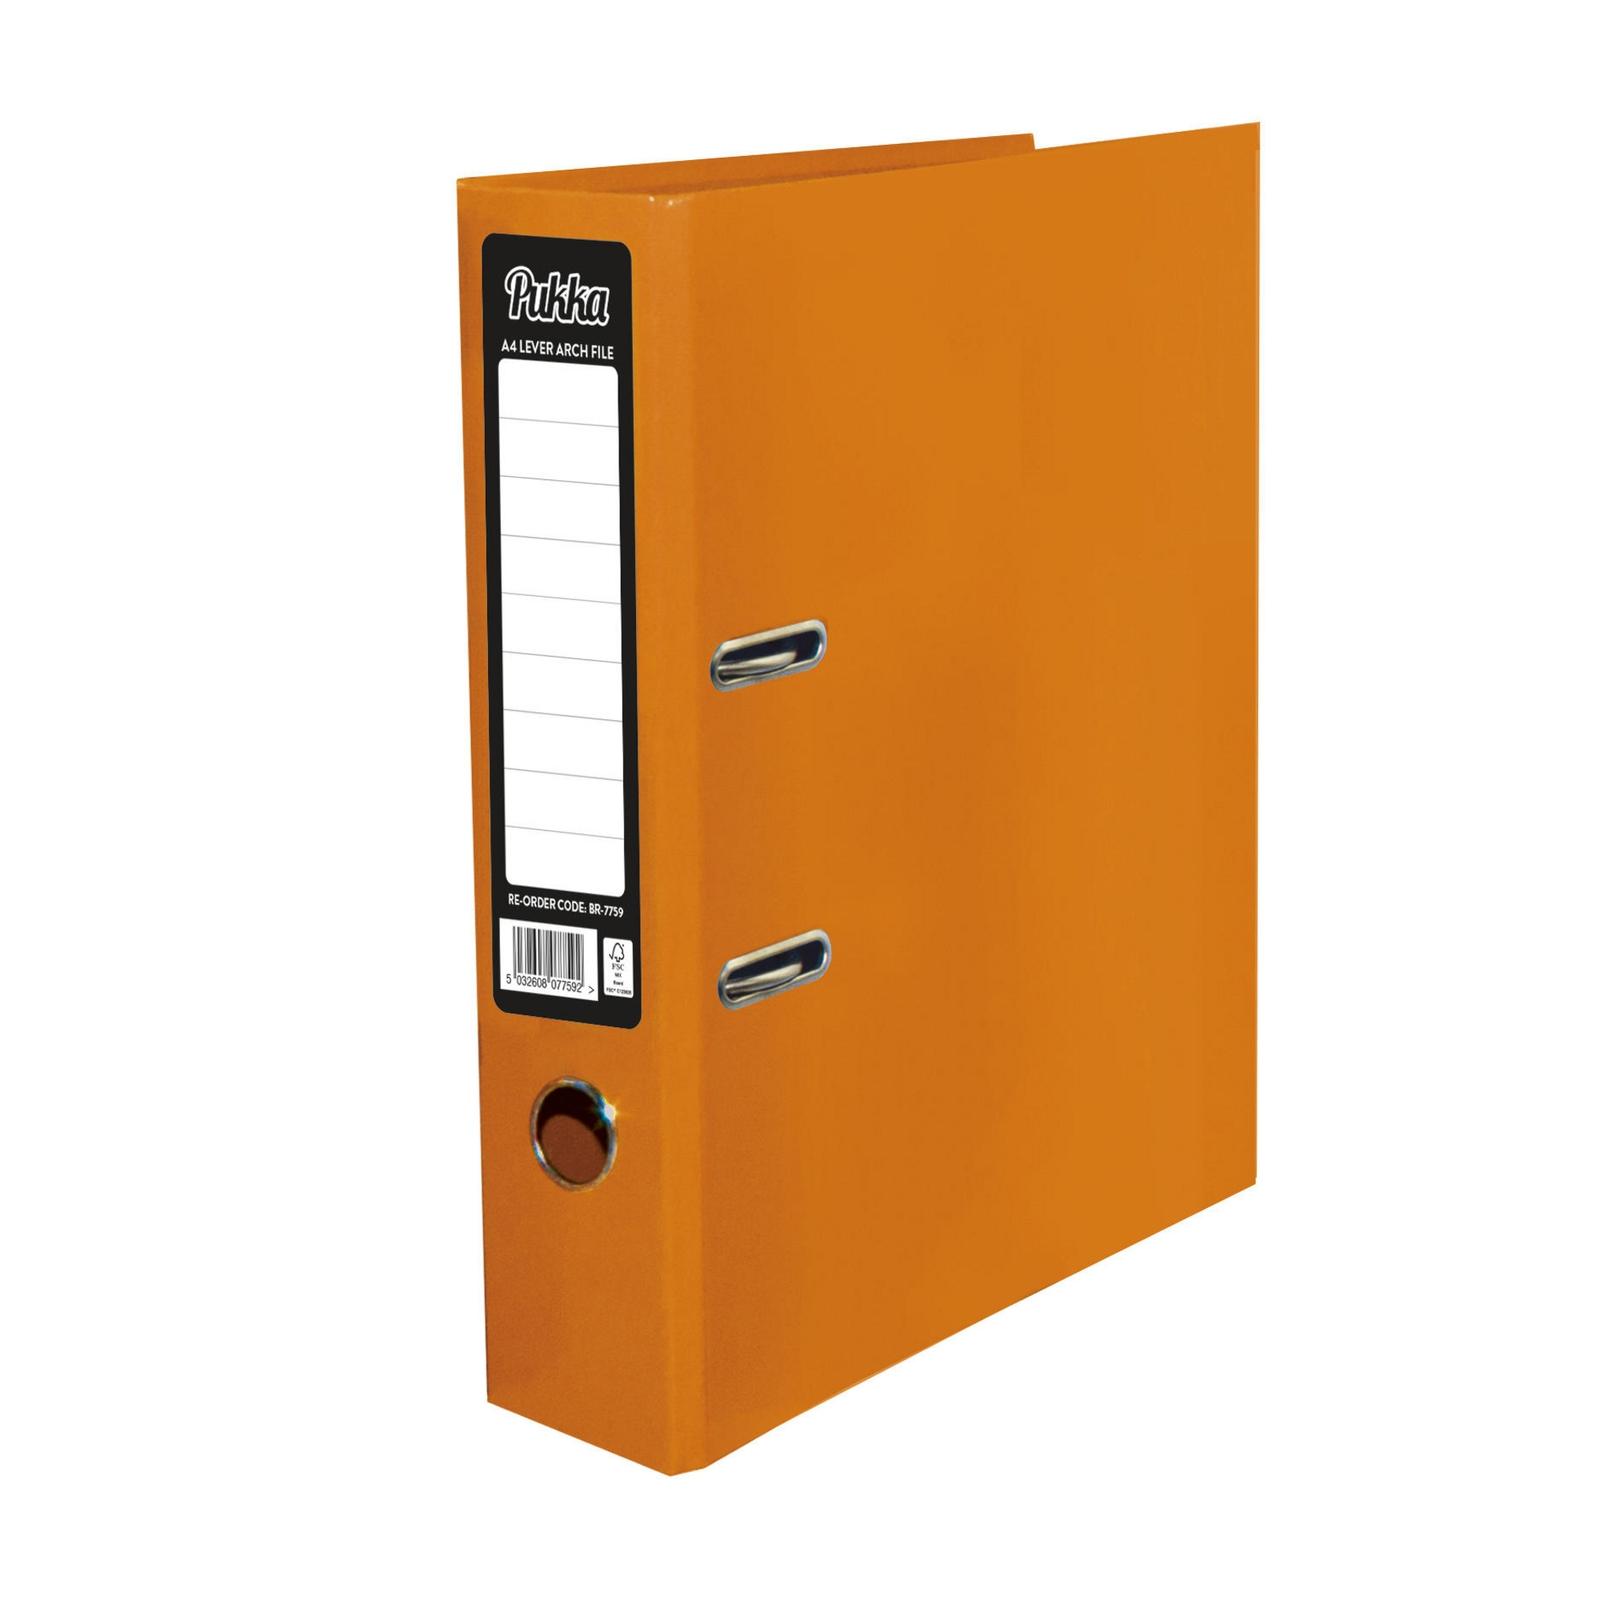 Pukka Lever Arch Files Orange - Pack of 10